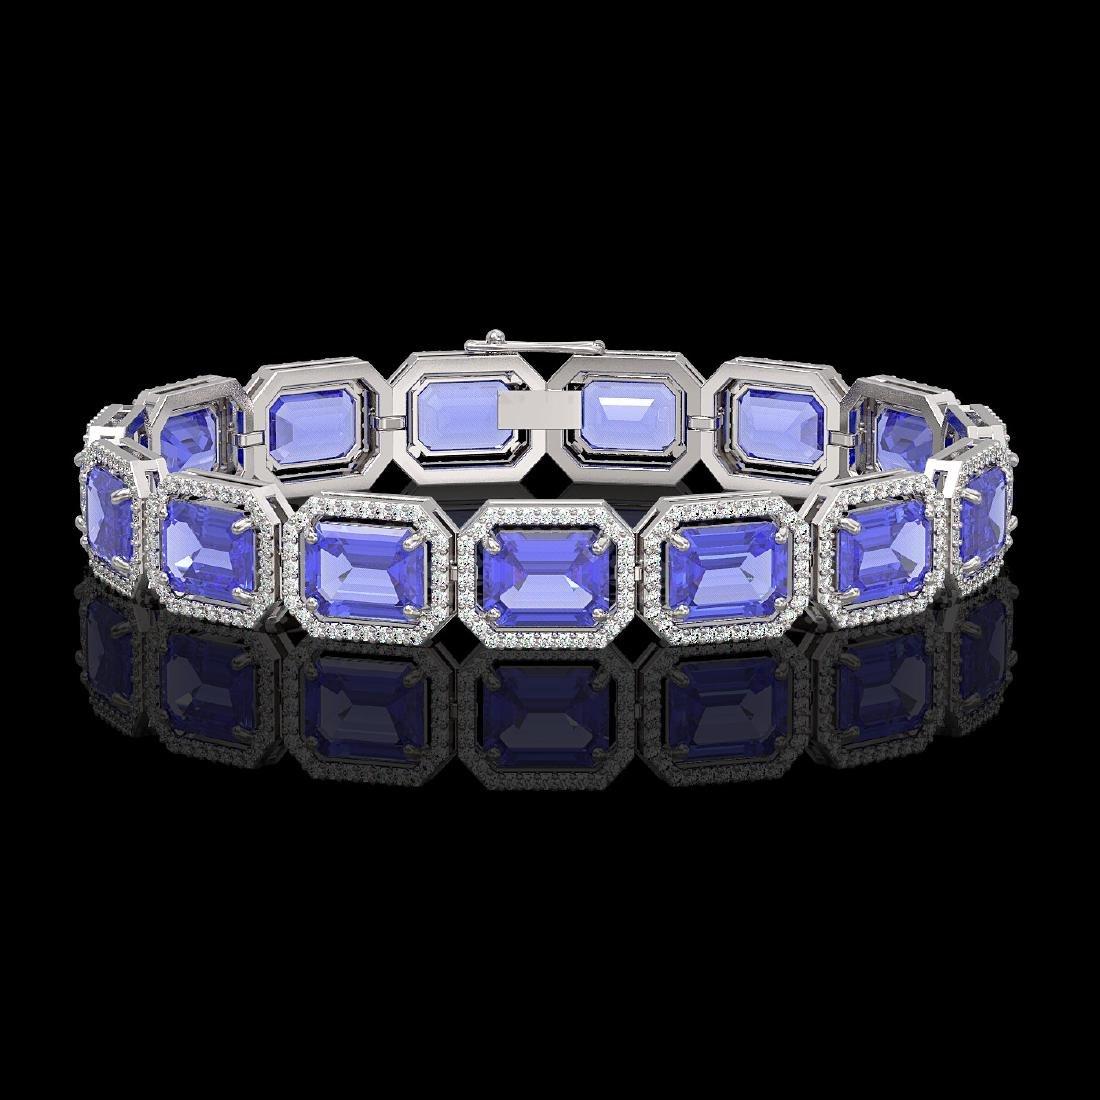 36.37 CTW Tanzanite & Diamond Halo Bracelet 10K White